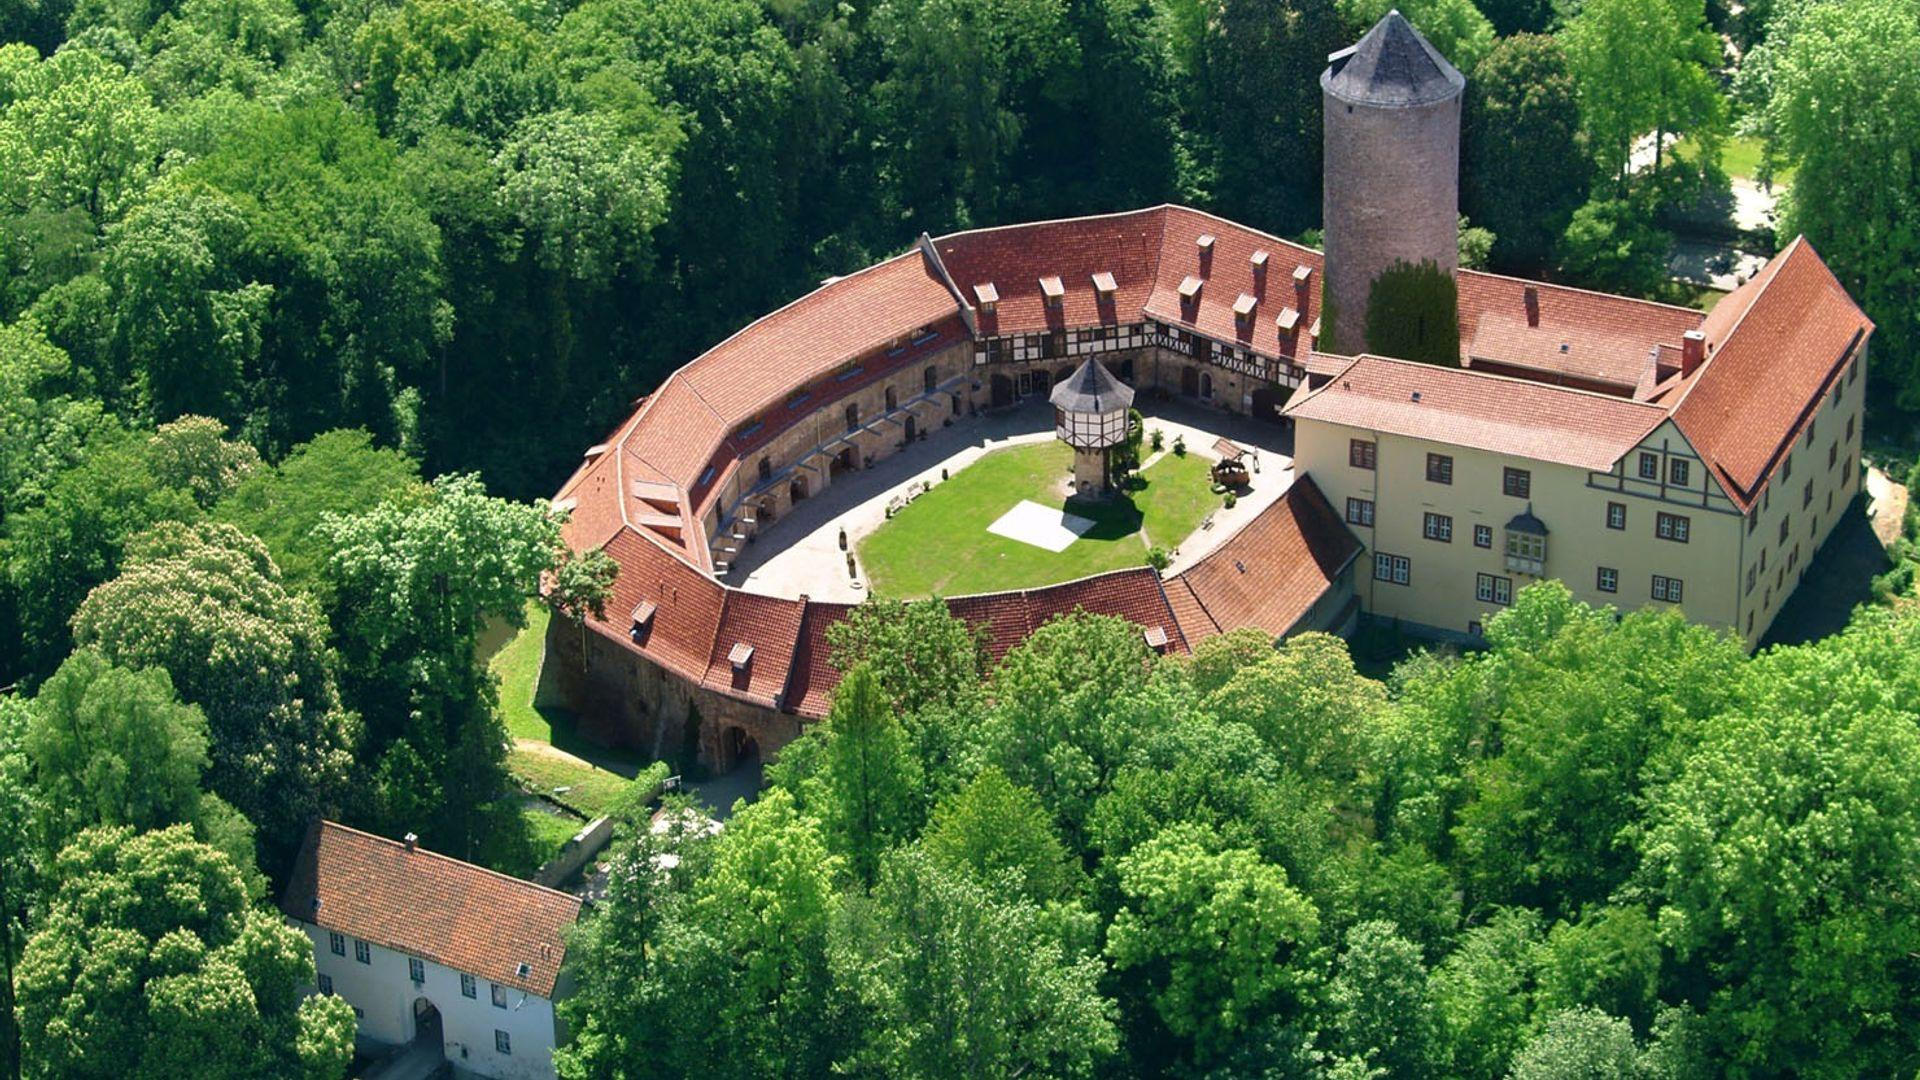 4*S Hotel & Spa Wasserschloss Westerburg